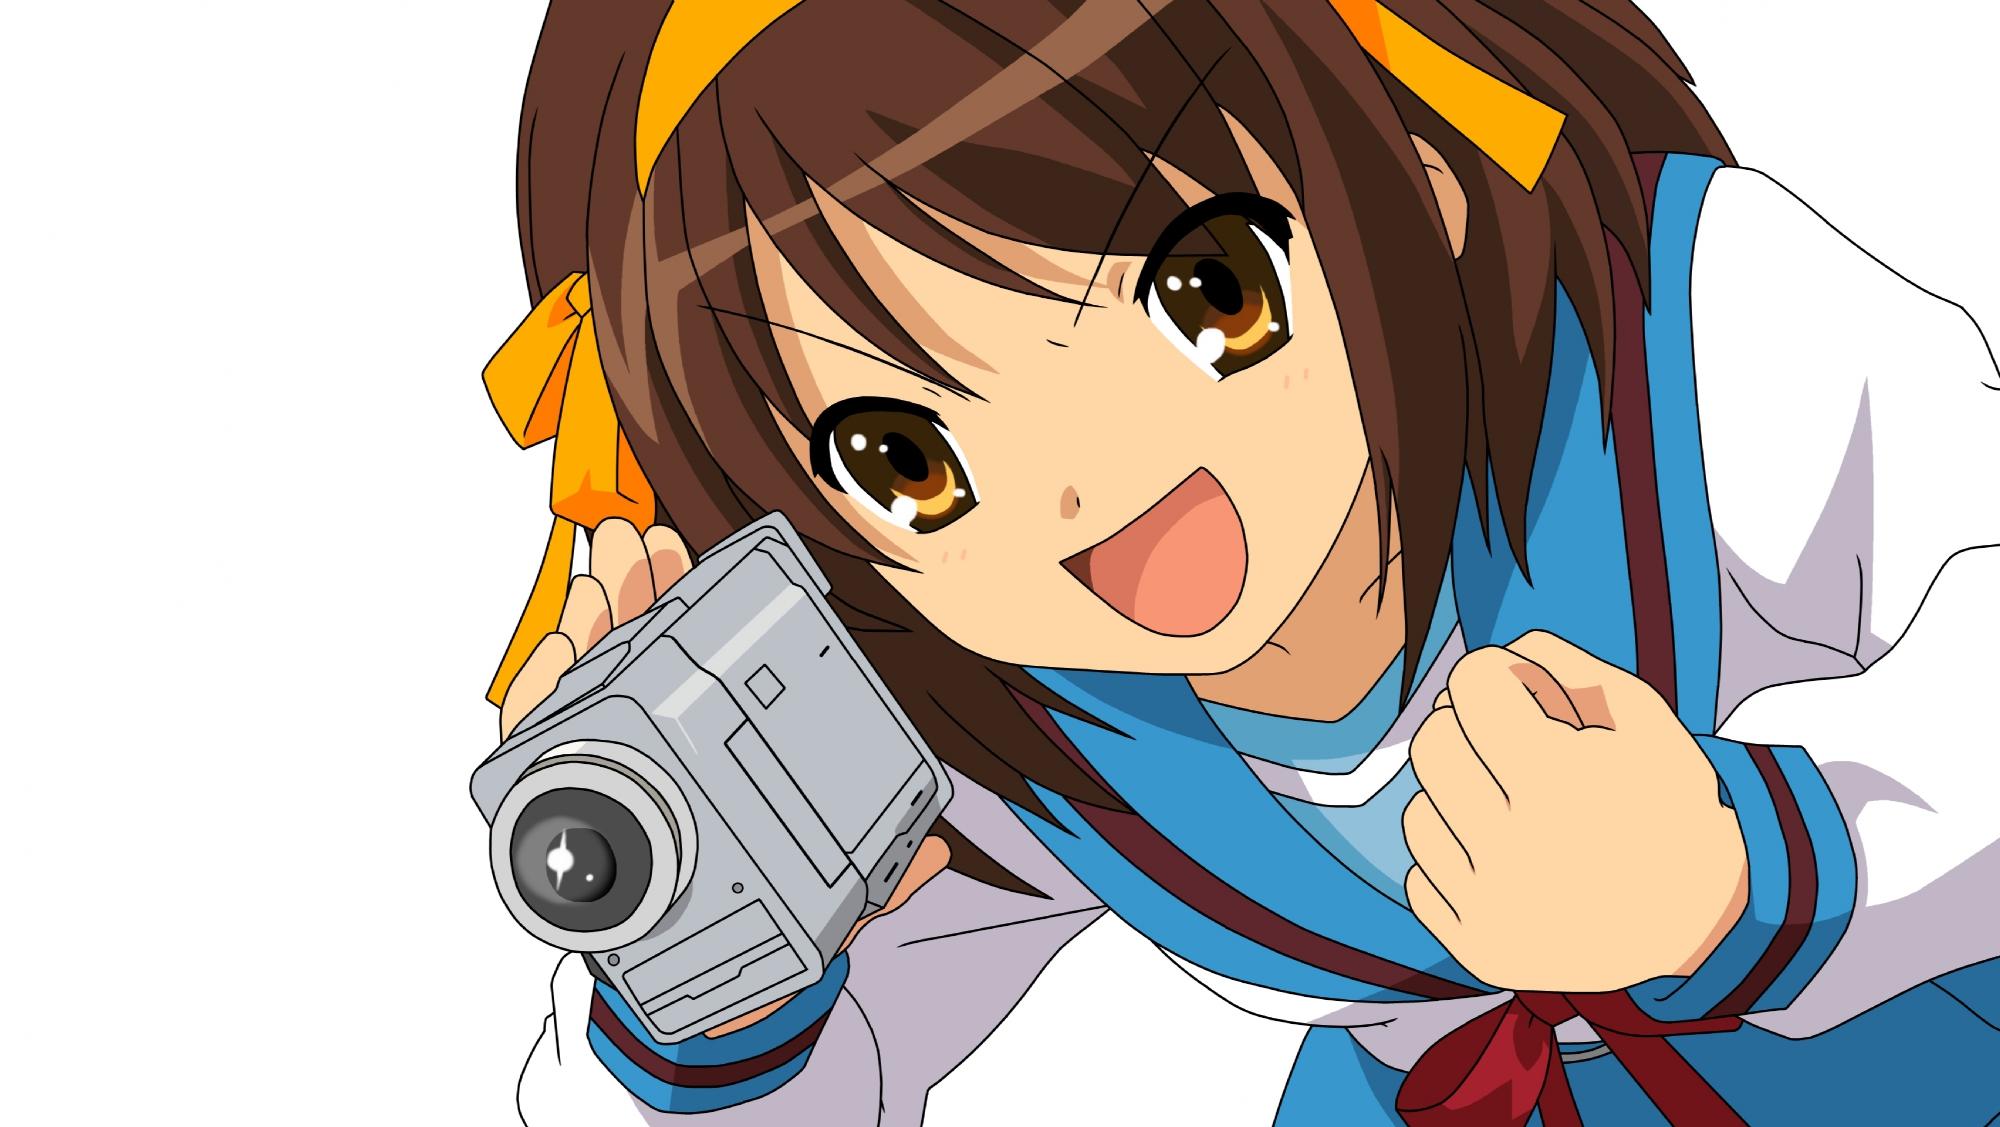 camera suzumiya_haruhi suzumiya_haruhi_no_yuutsu vector white